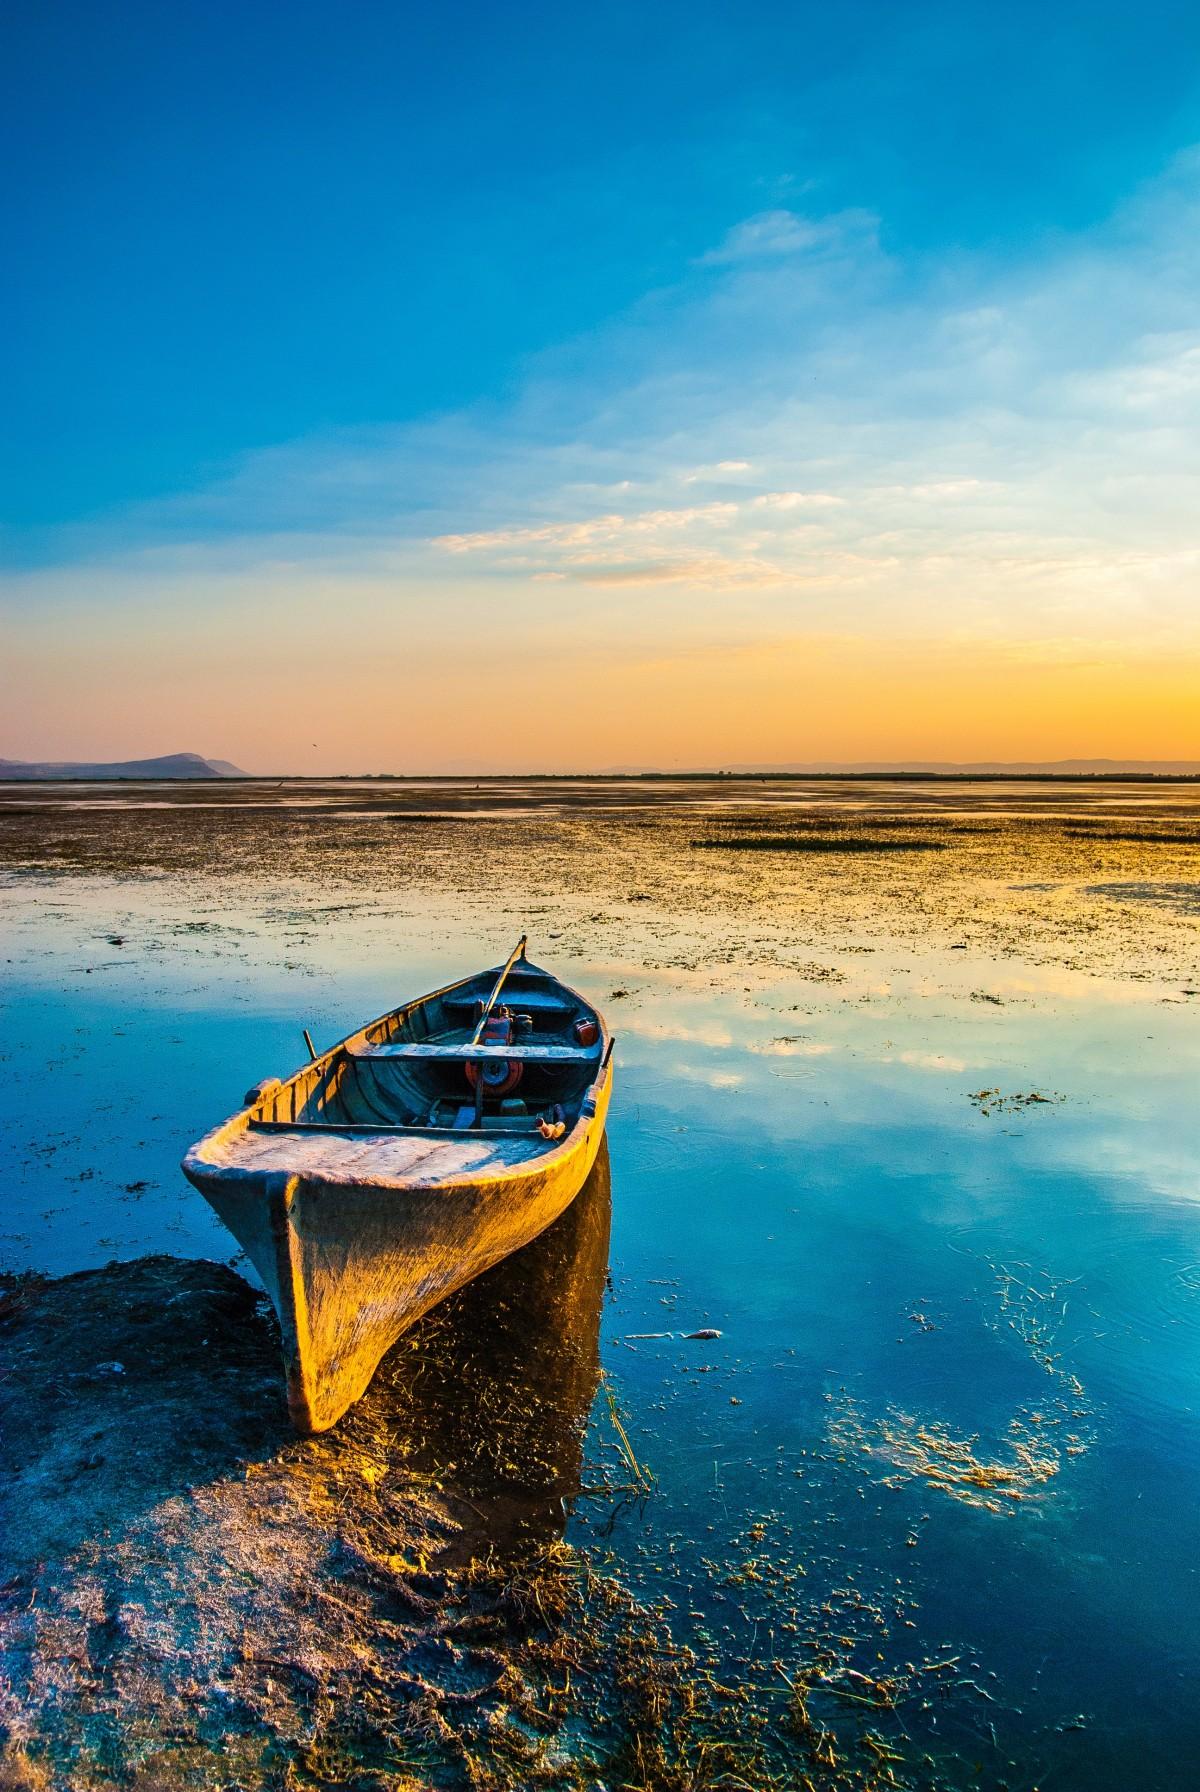 Iphone Cloud Wallpaper Free Images Beach Coast Sand Ocean Horizon Light